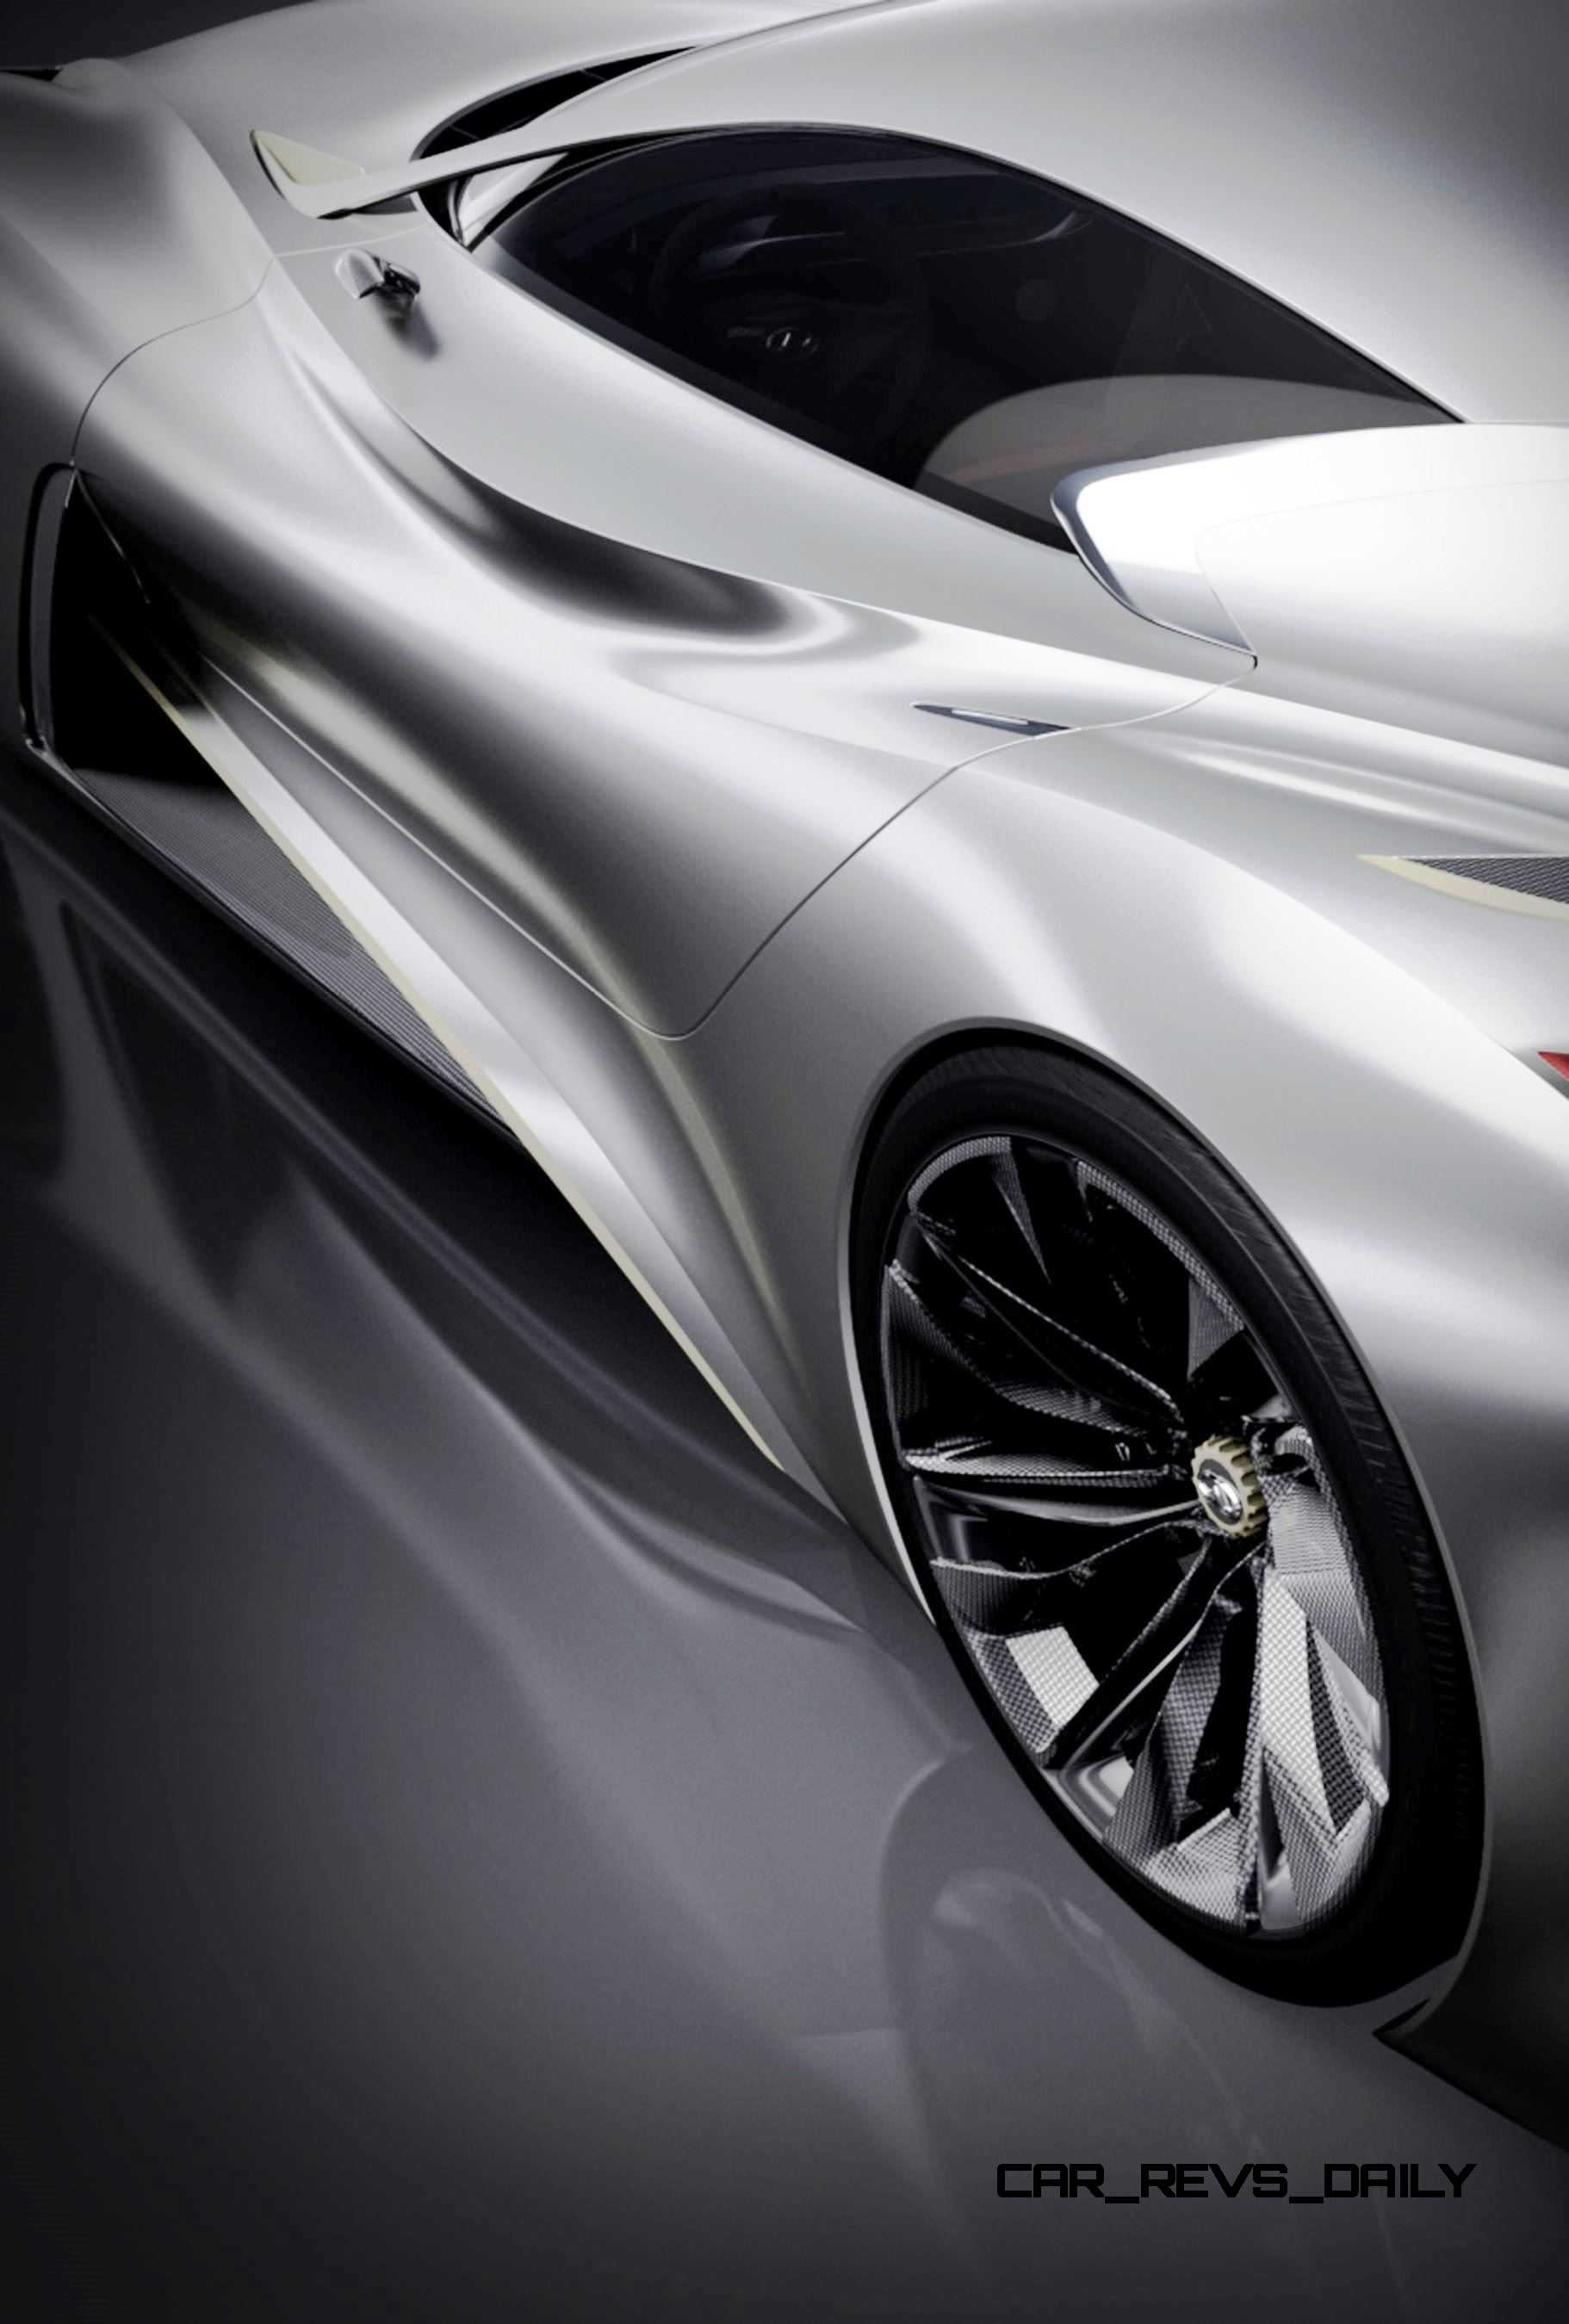 2014 INFINITI Concept Vision Gran Turismo 55